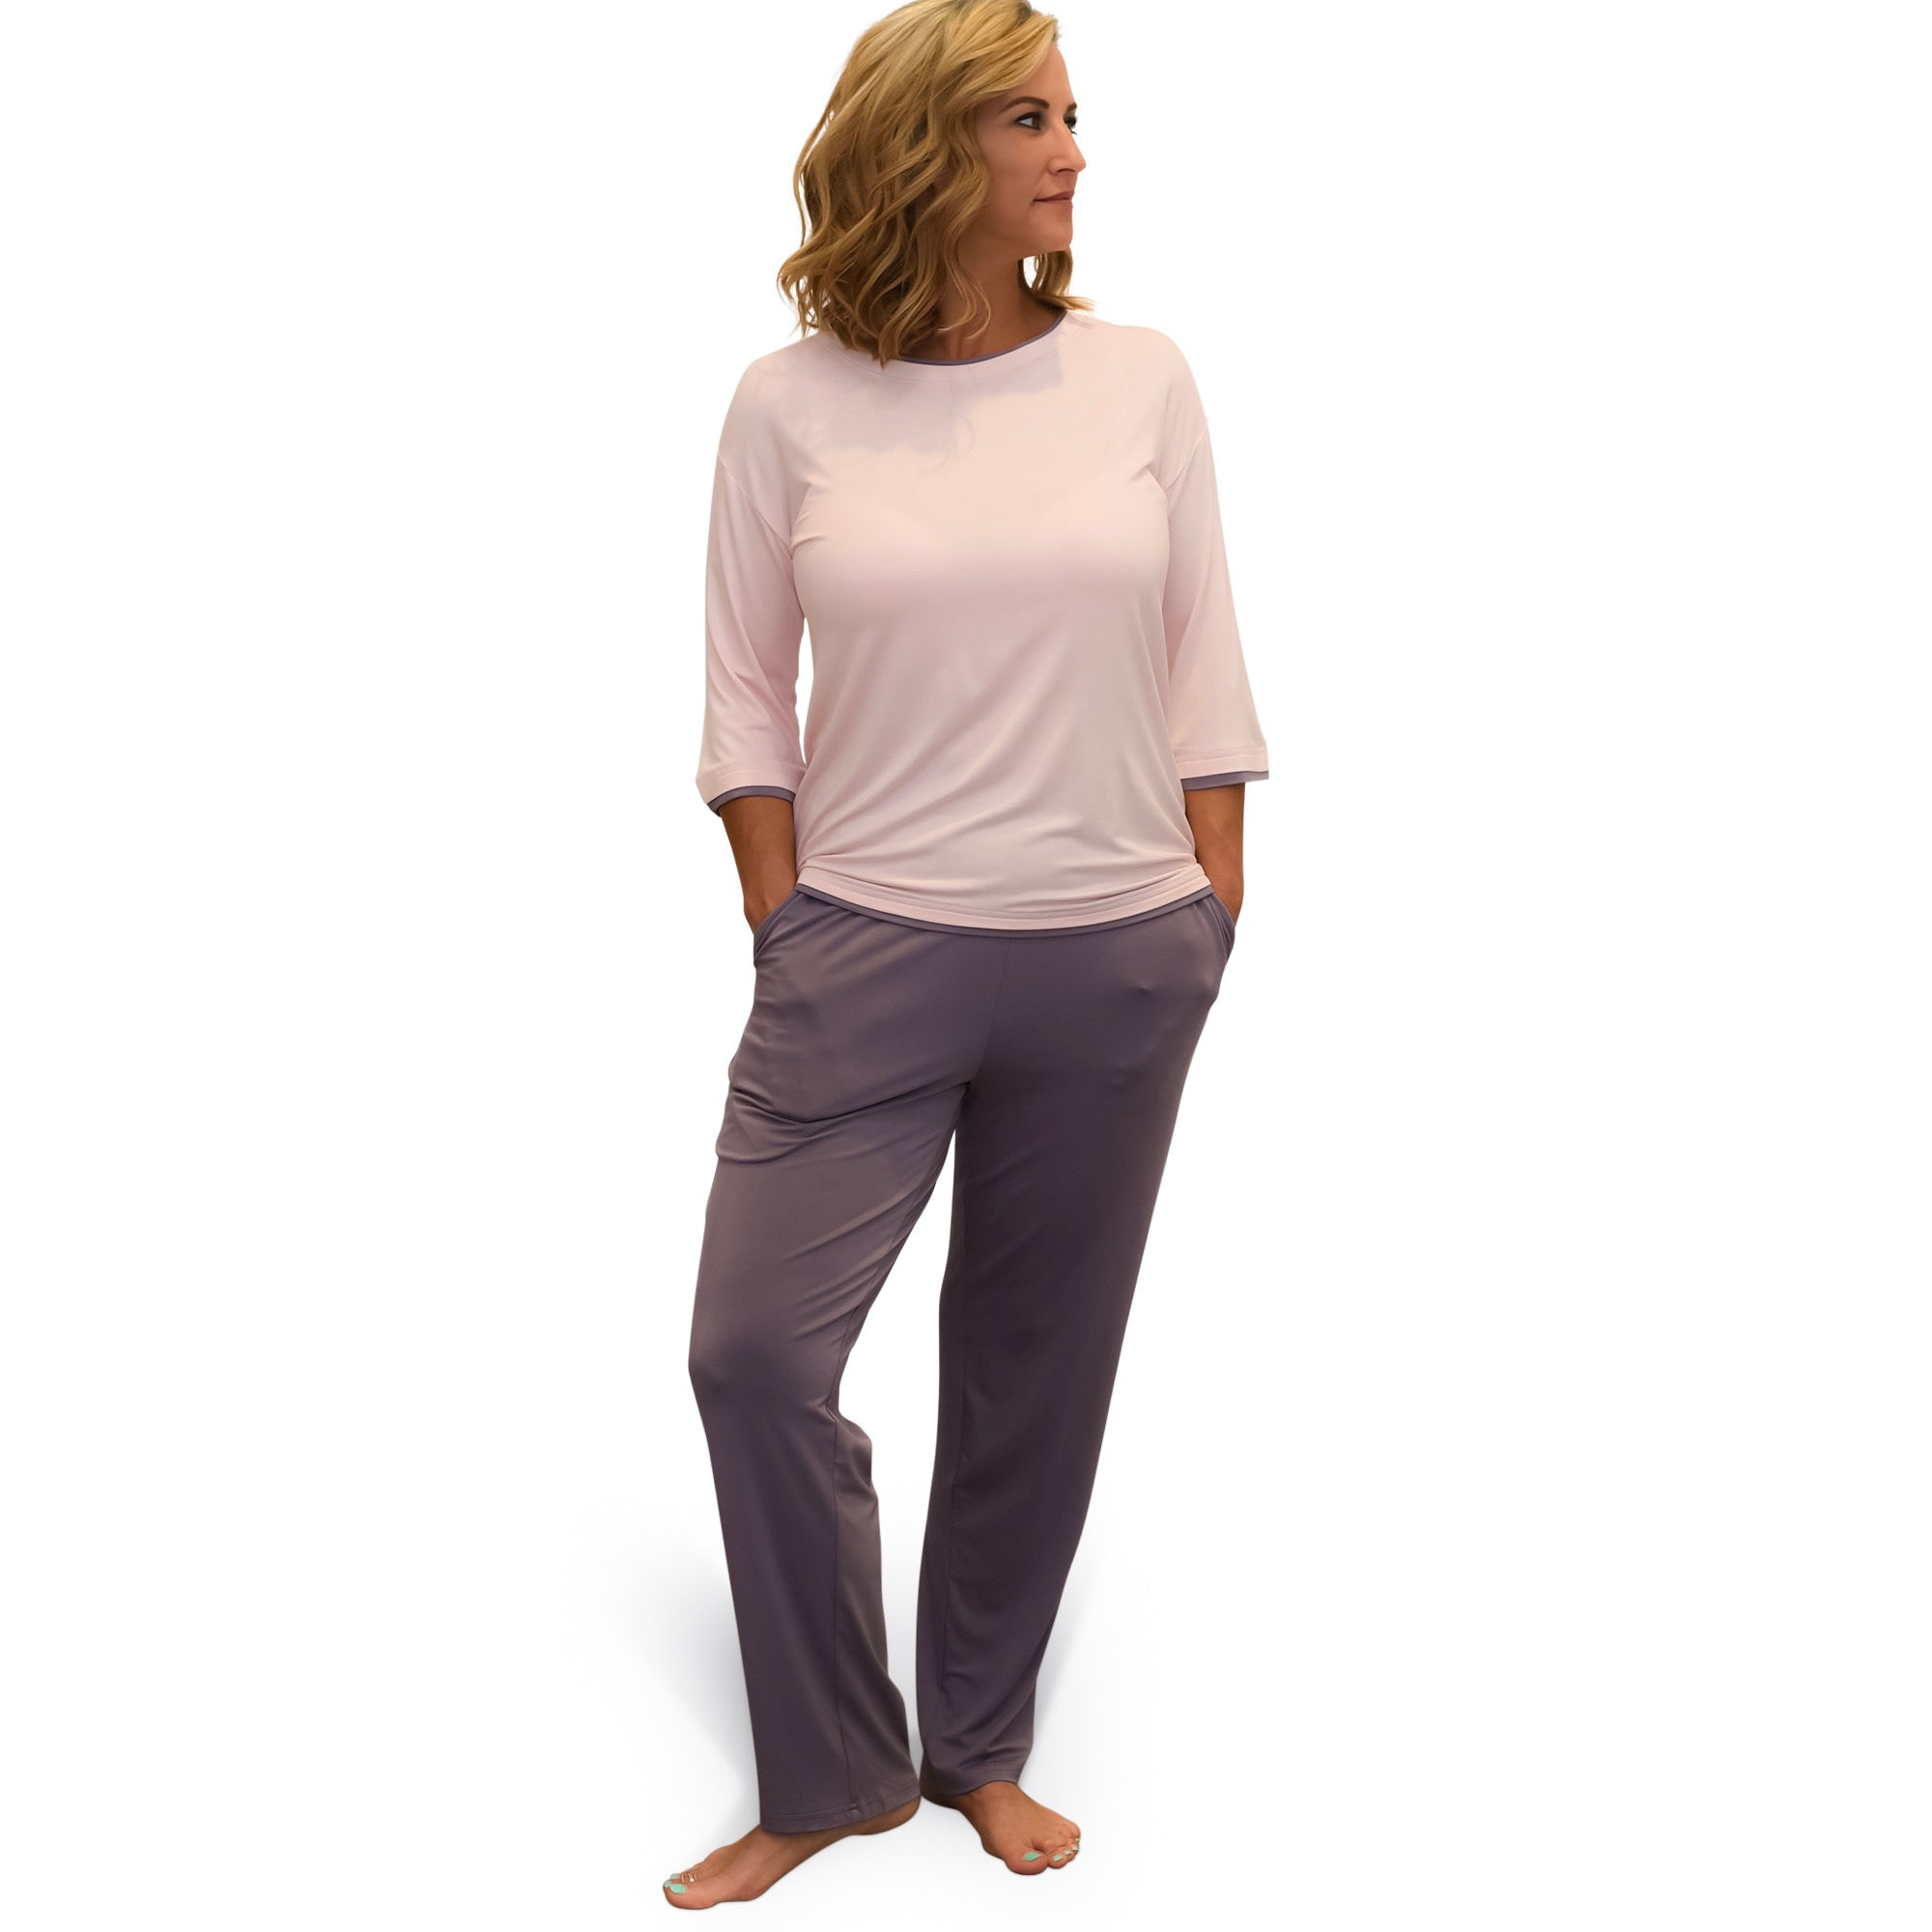 BambooYou BambooYou Heavenly Pink & Gray Pajama Set